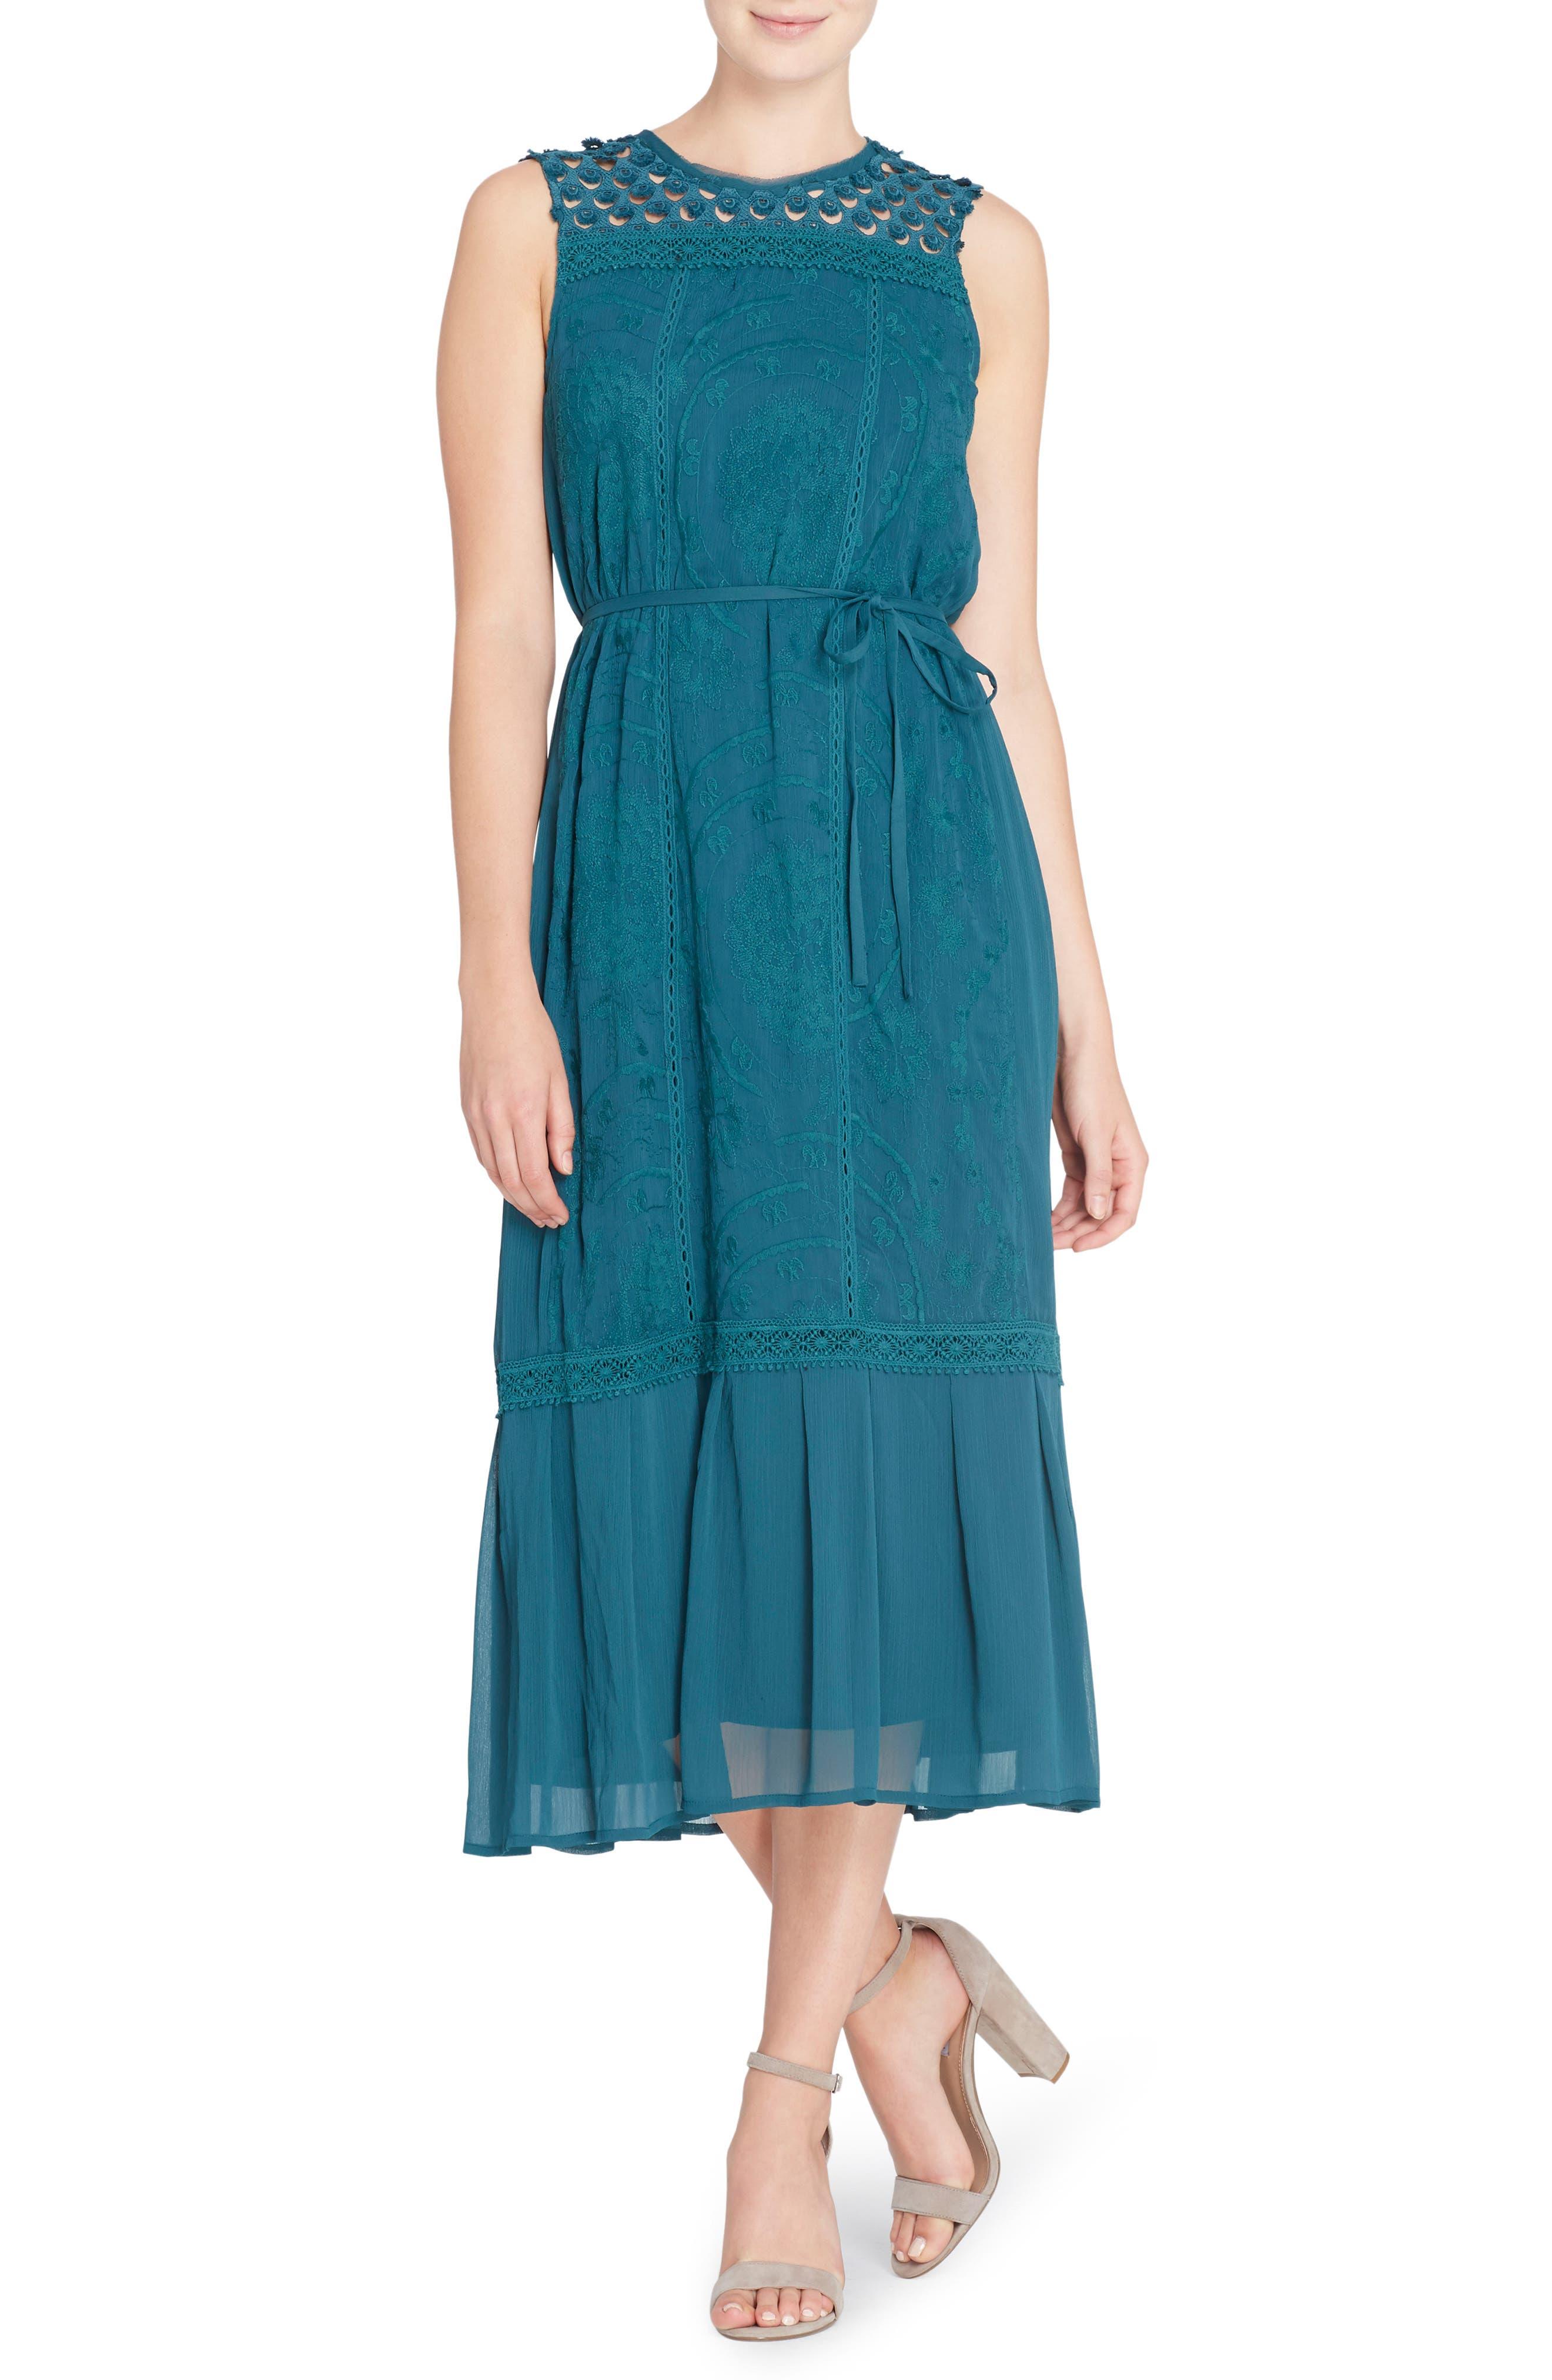 Ellen Embroidered Midi Dress,                             Main thumbnail 1, color,                             Deep Teal